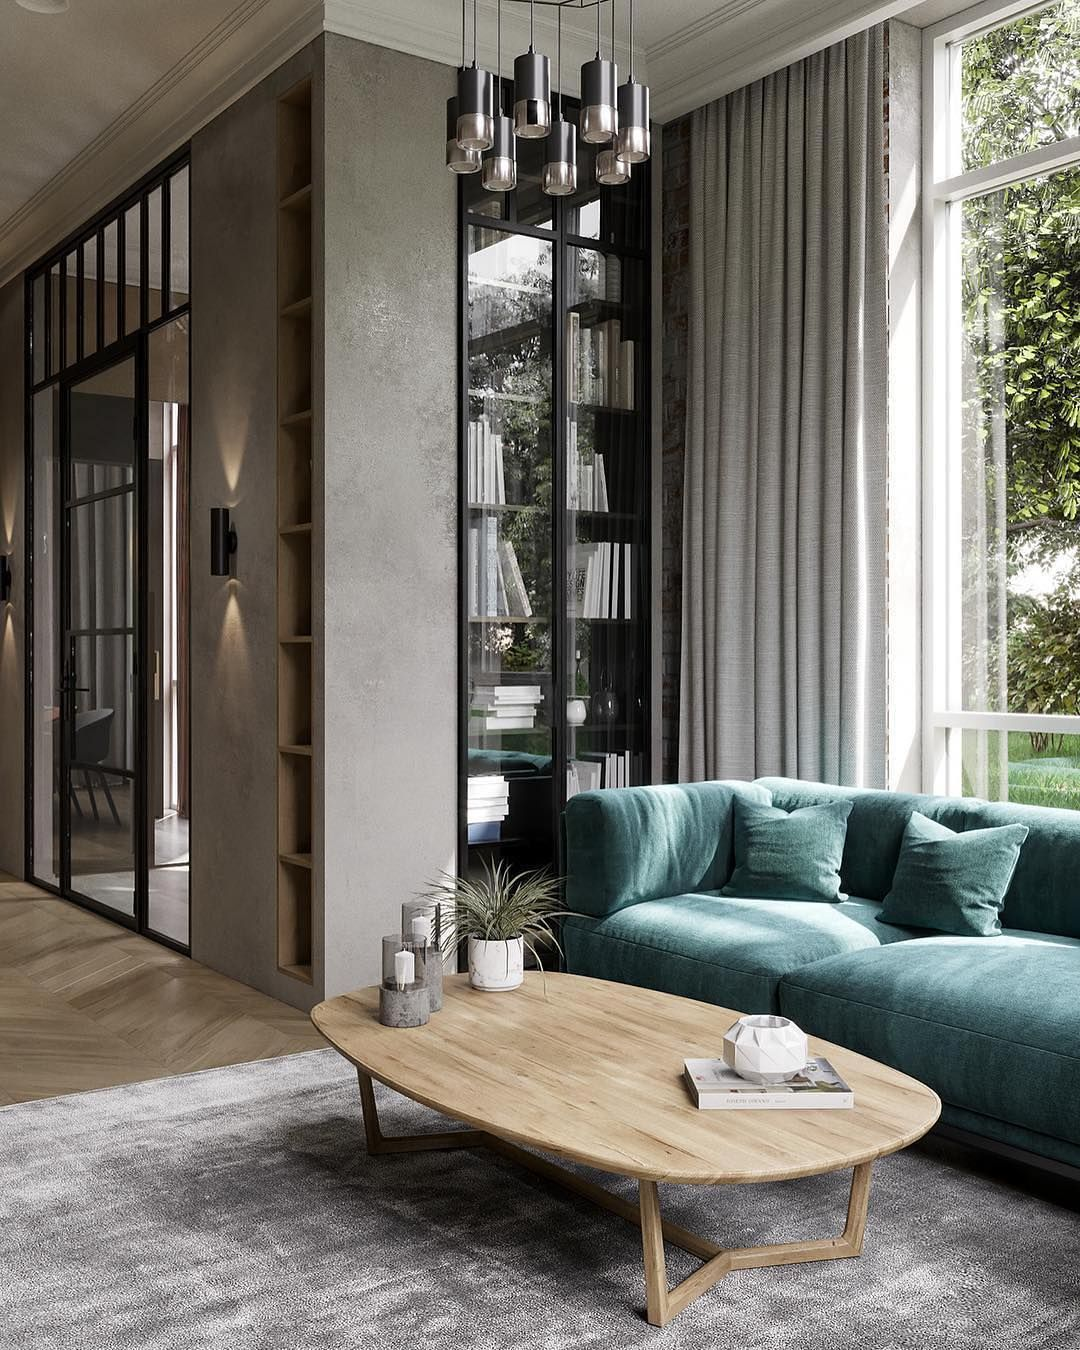 Best Uk Interior Designers Projects Www Delightfull Eu Visit Us For Interior Desig Contemporary Interior Design Living Room Interior Home Interior Design